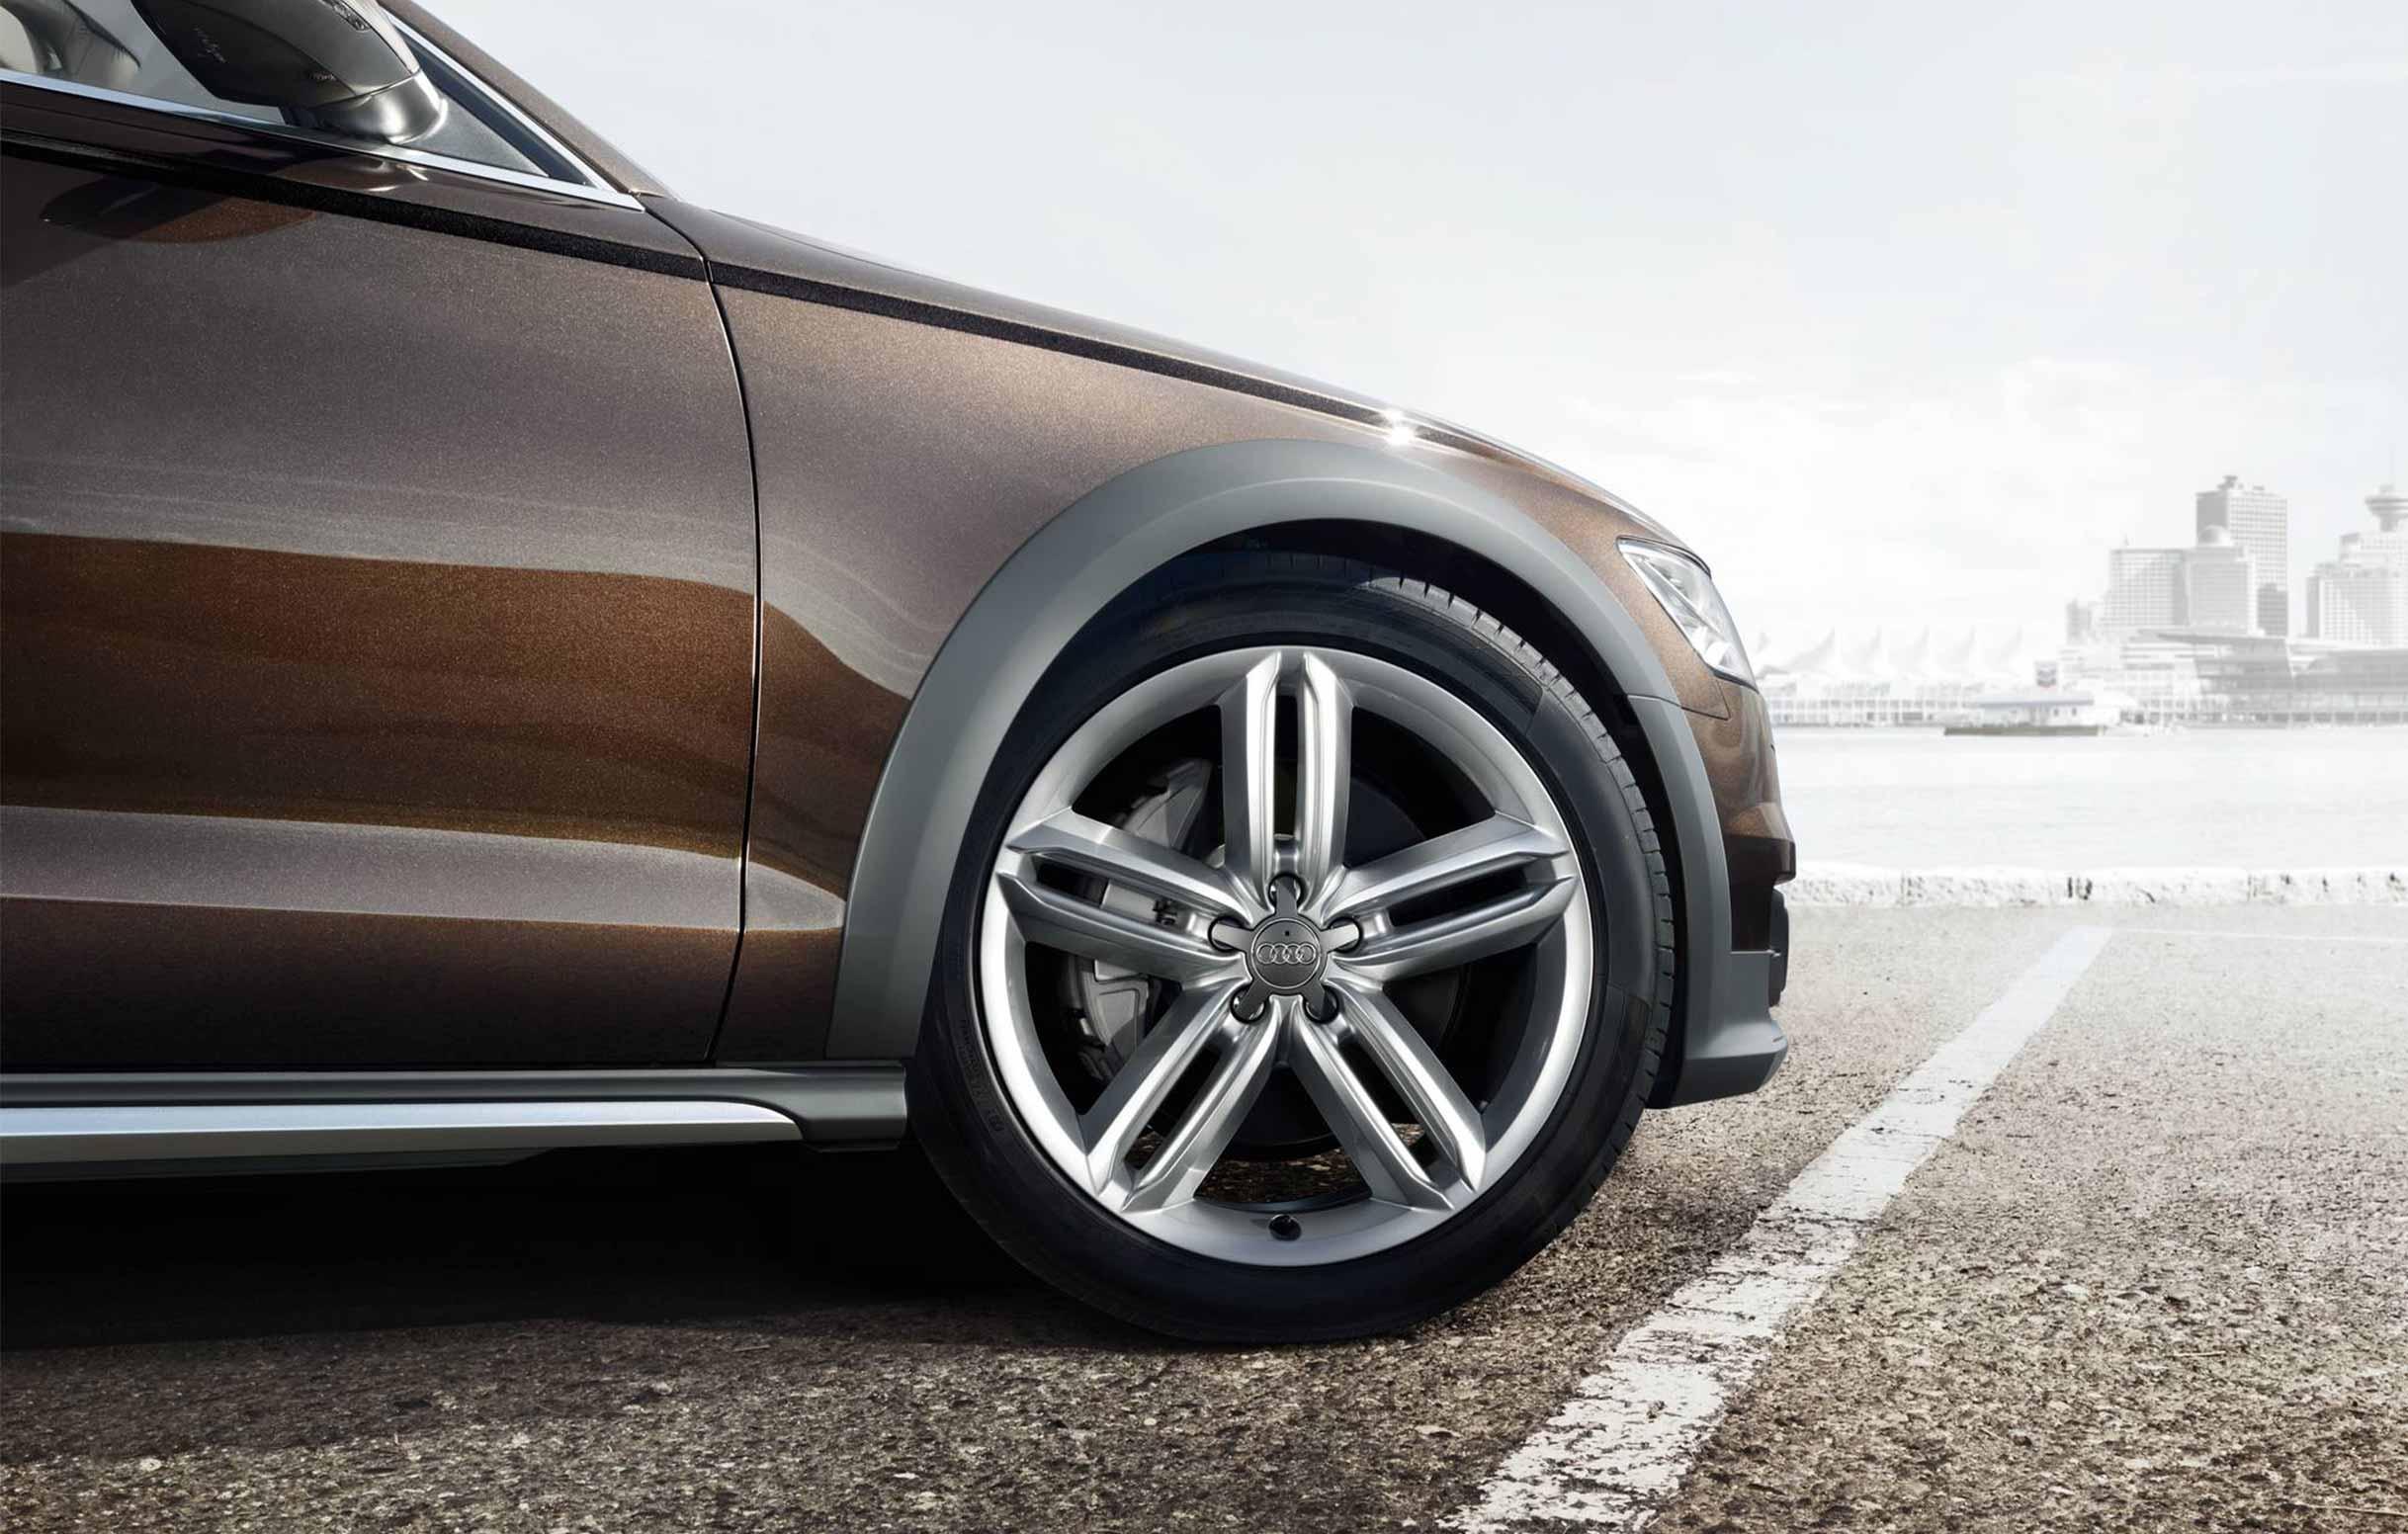 2436x1552_A6_allroad_quattro_Wheel.jpg